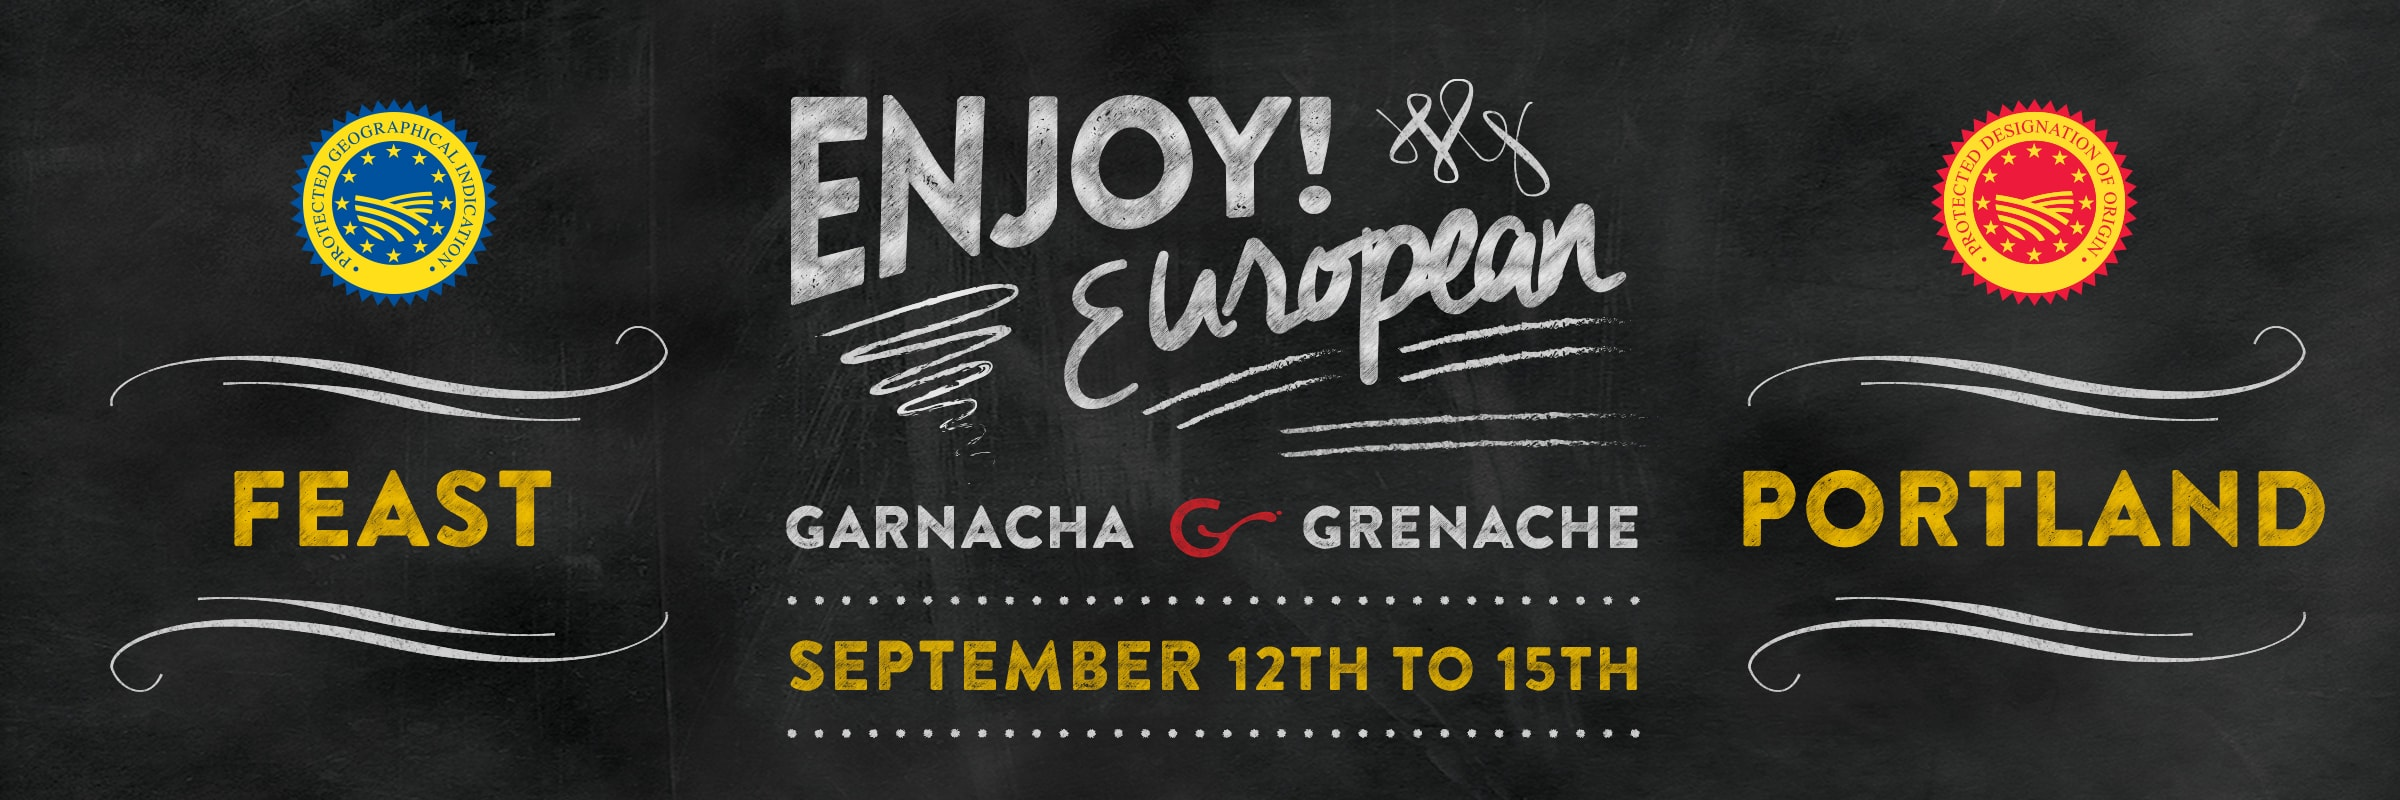 Garnacha Grenache - Feast Portland